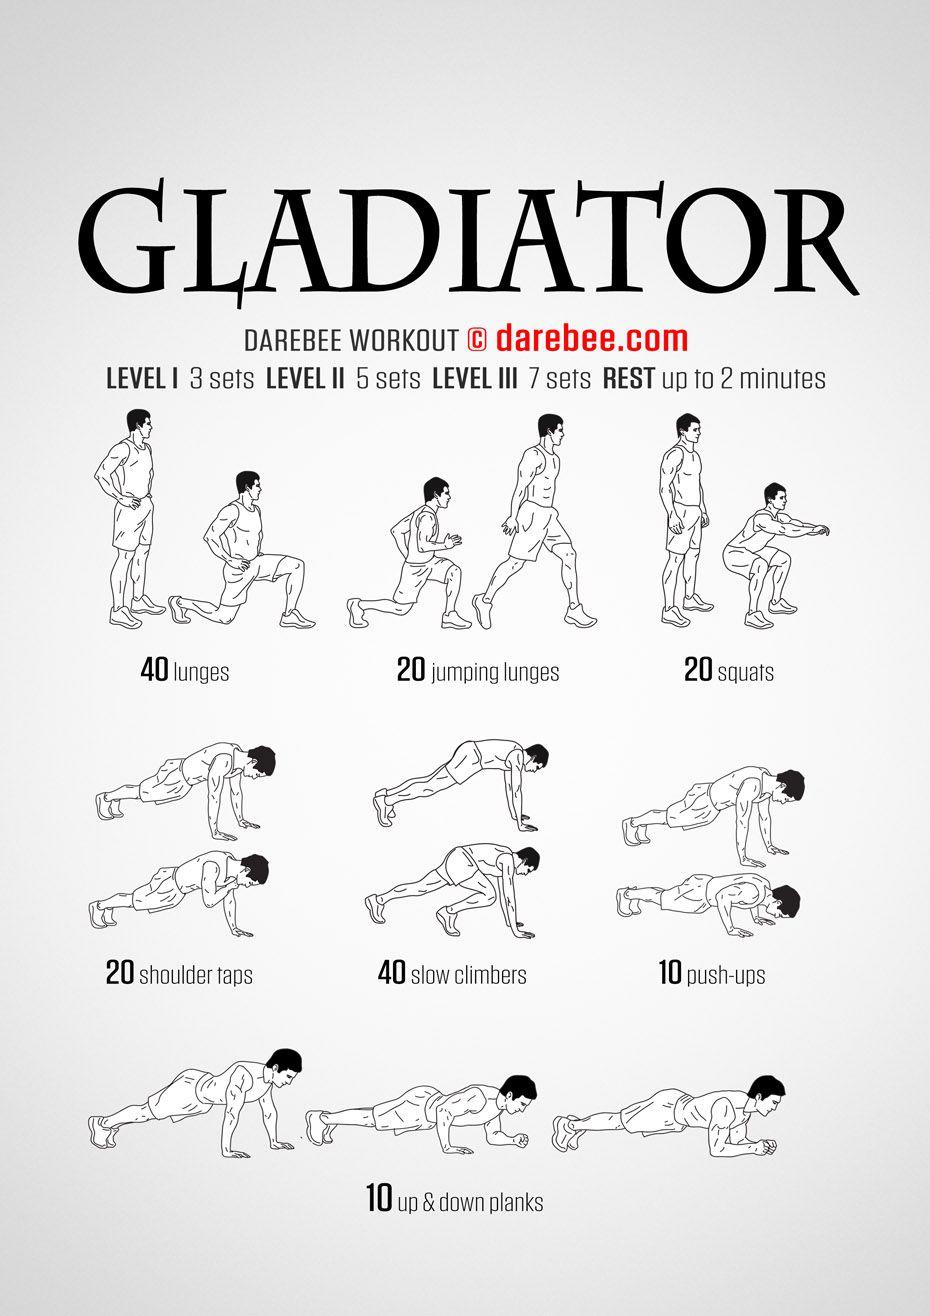 rigagreen - Revoflex xtreme exercise guide pdf